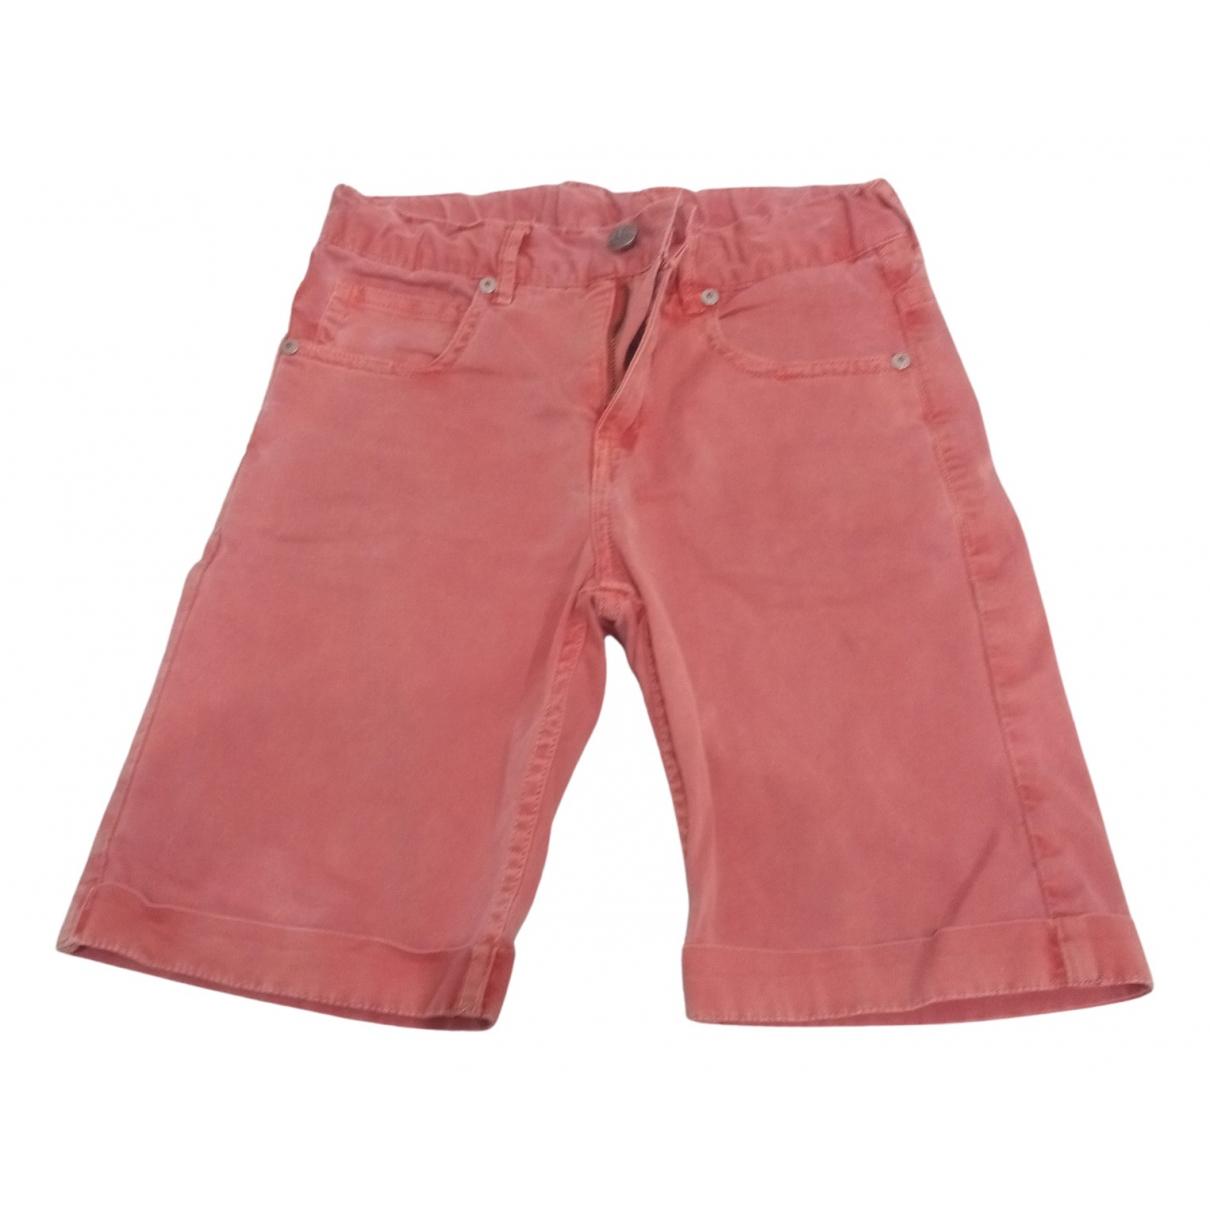 Hackett London \N Shorts in  Rosa Denim - Jeans